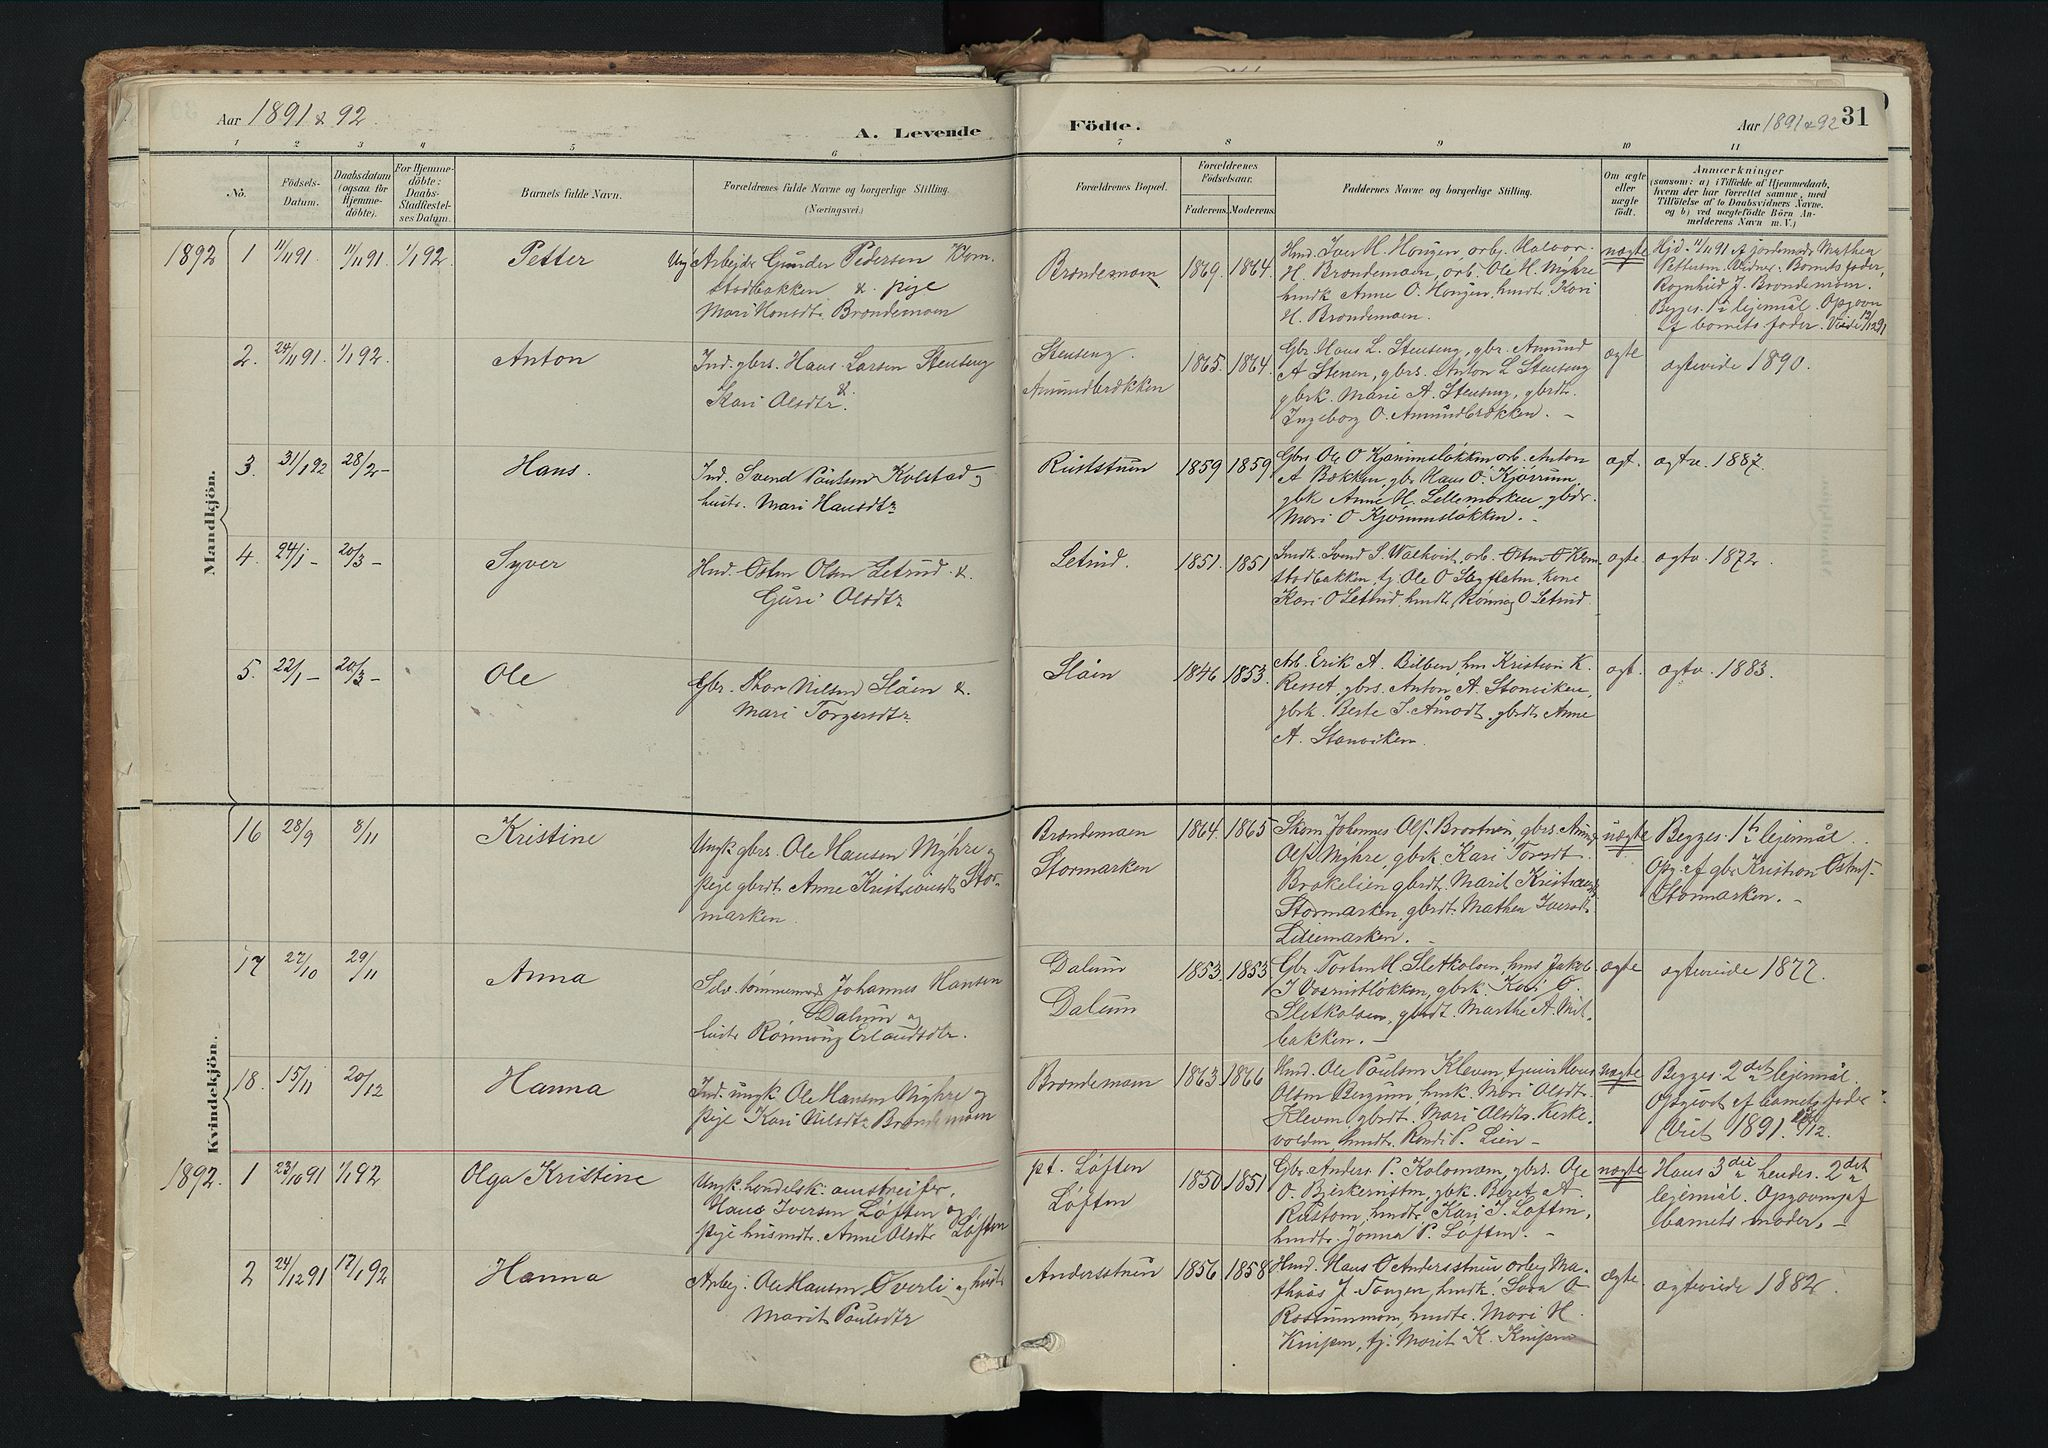 SAH, Nord-Fron prestekontor, Ministerialbok nr. 3, 1884-1914, s. 31